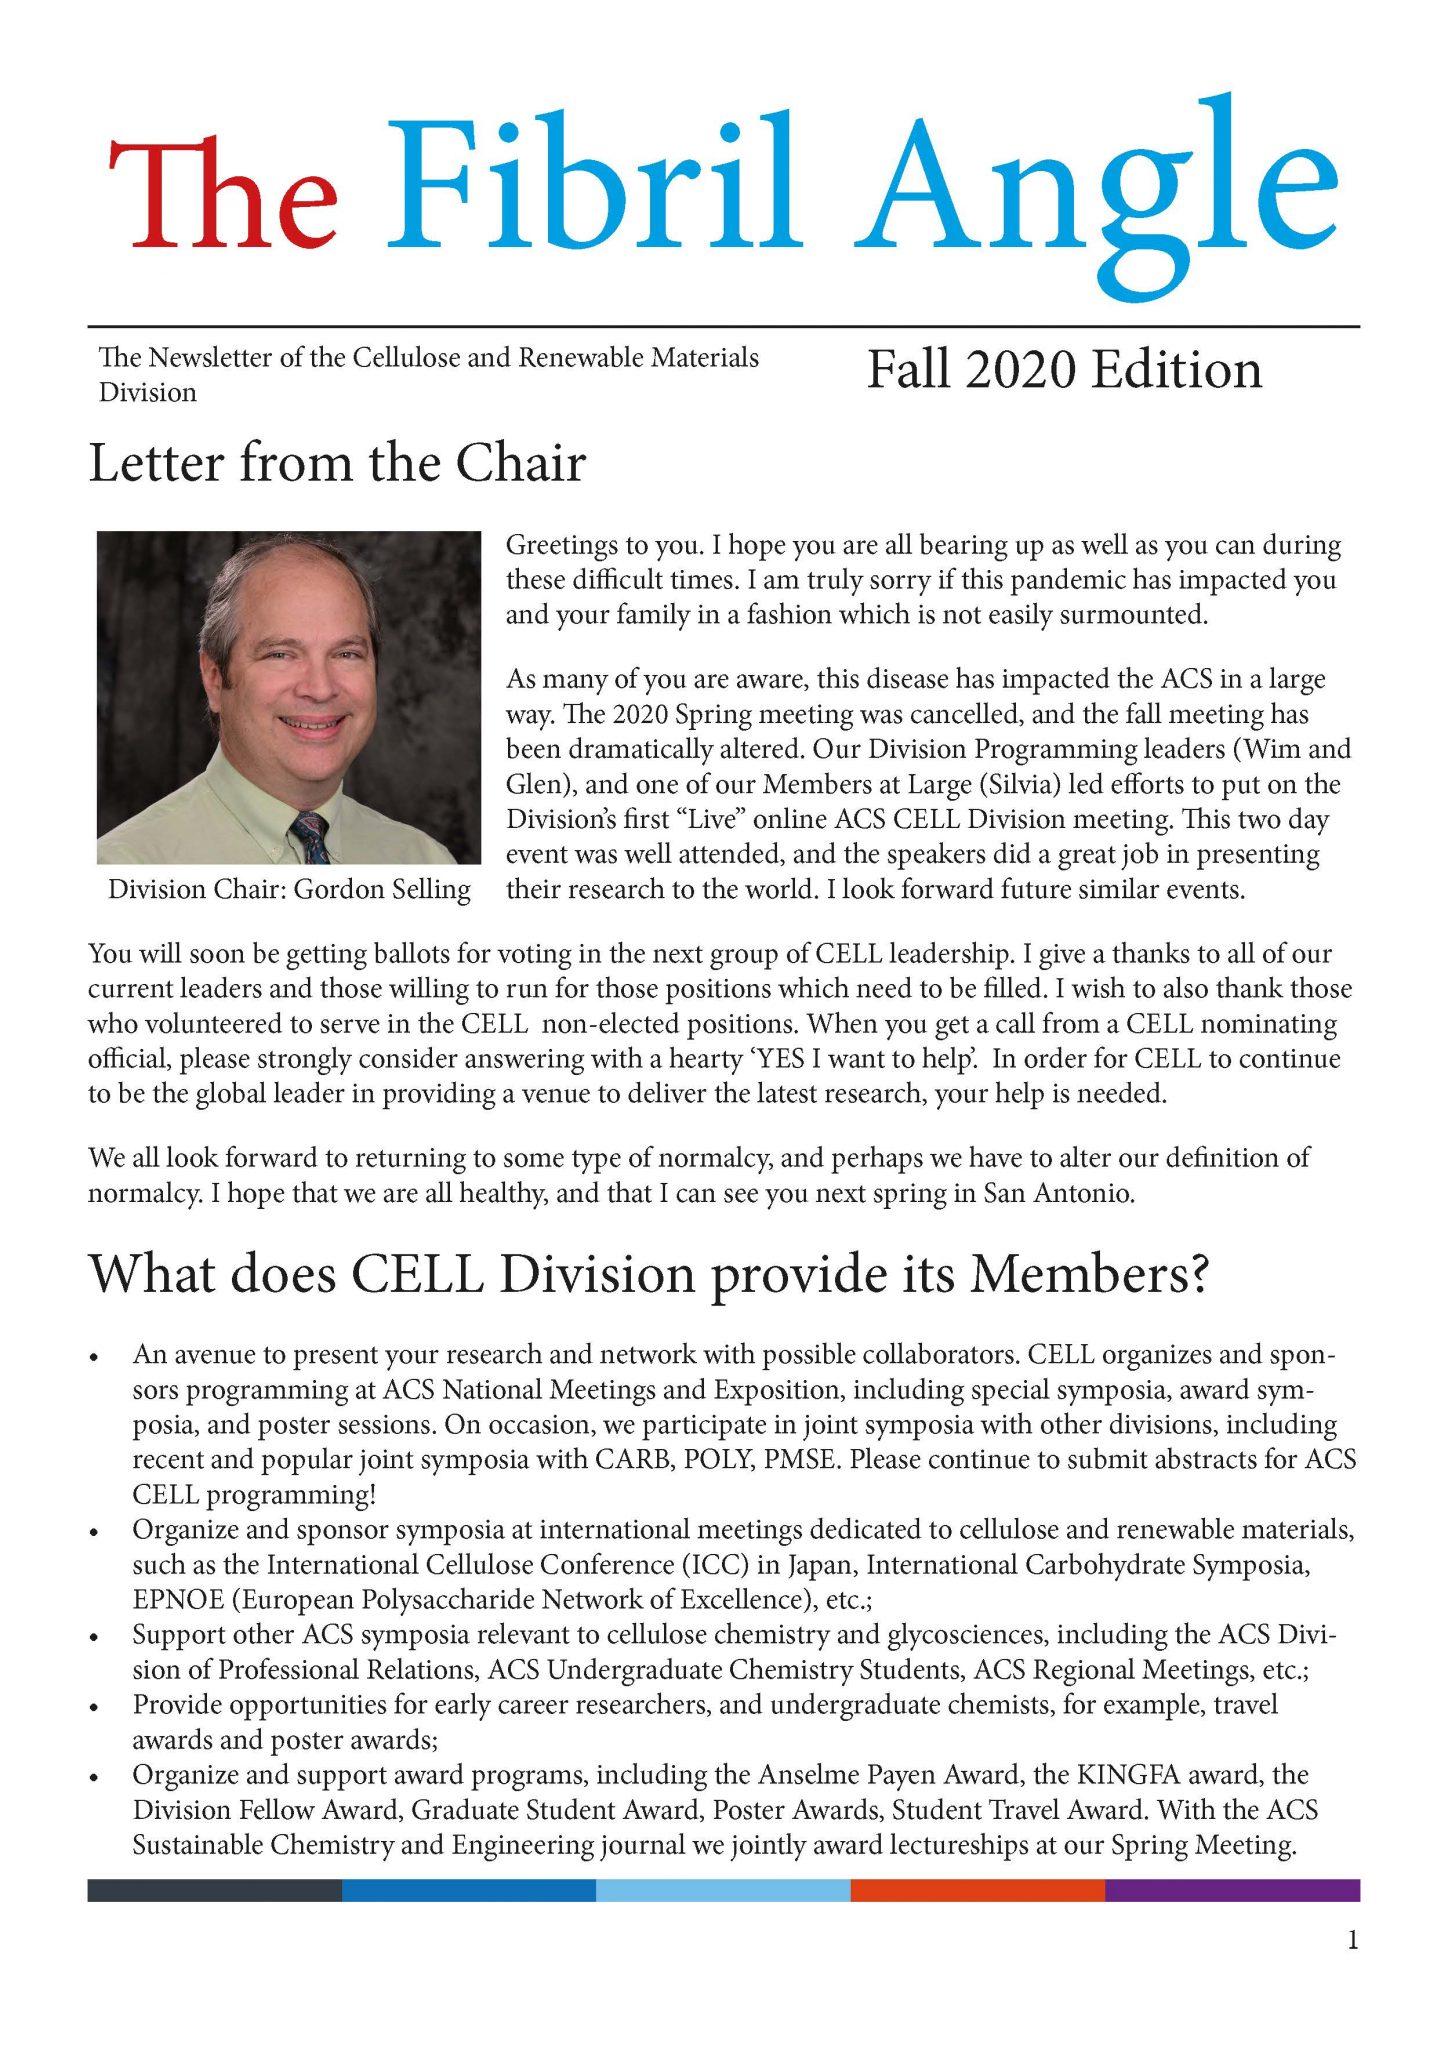 TFA Fall 2020 main page